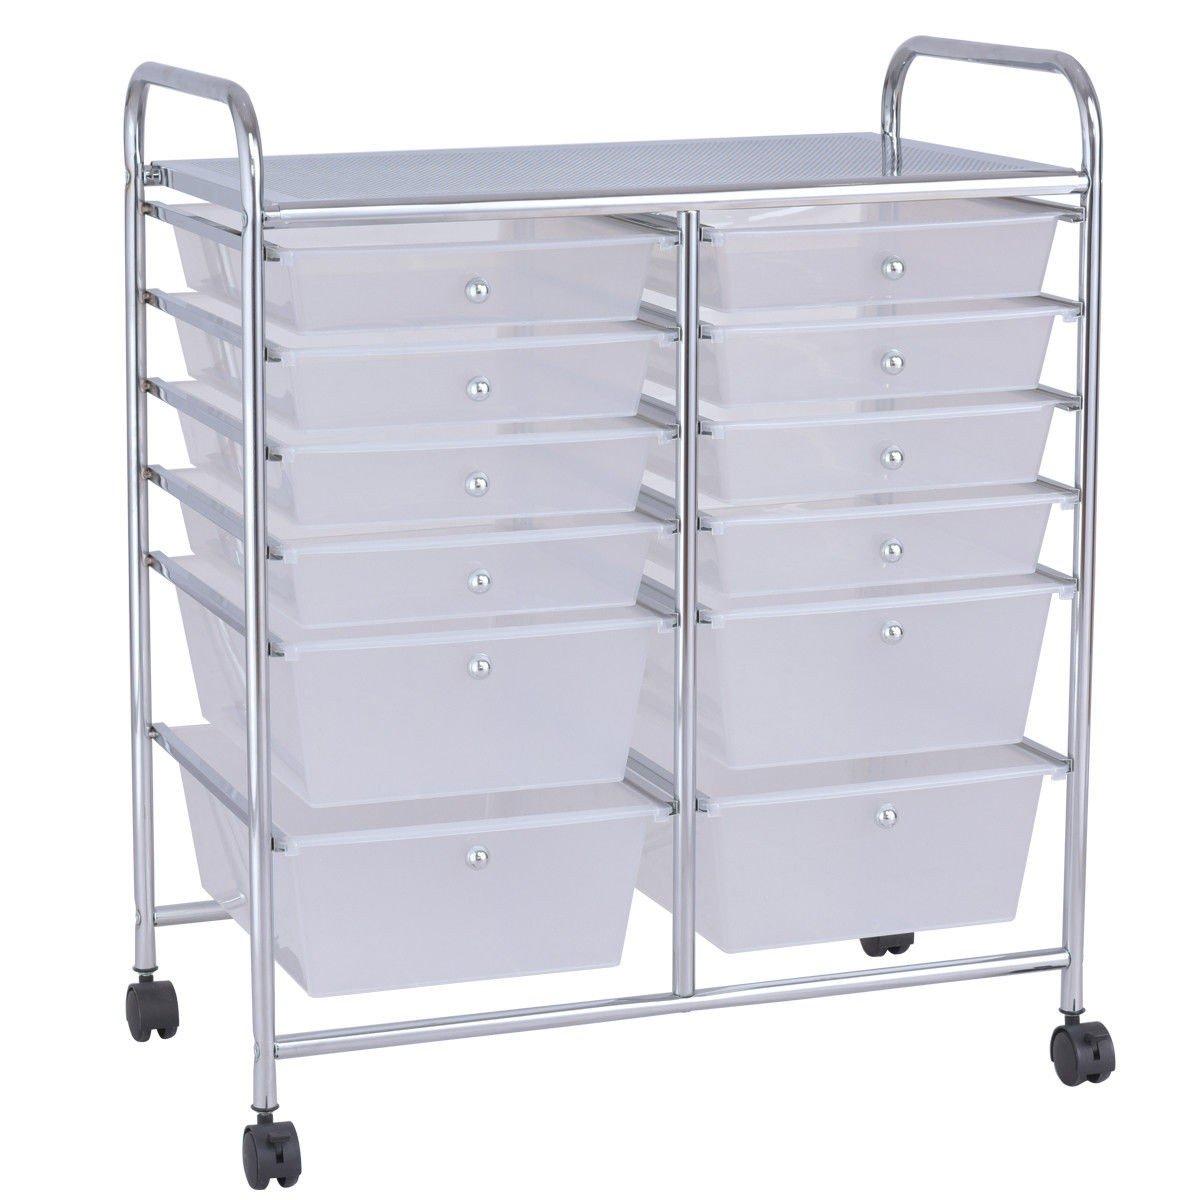 MD Group 12 Storage Drawer Organizer Bins Rolling Cart